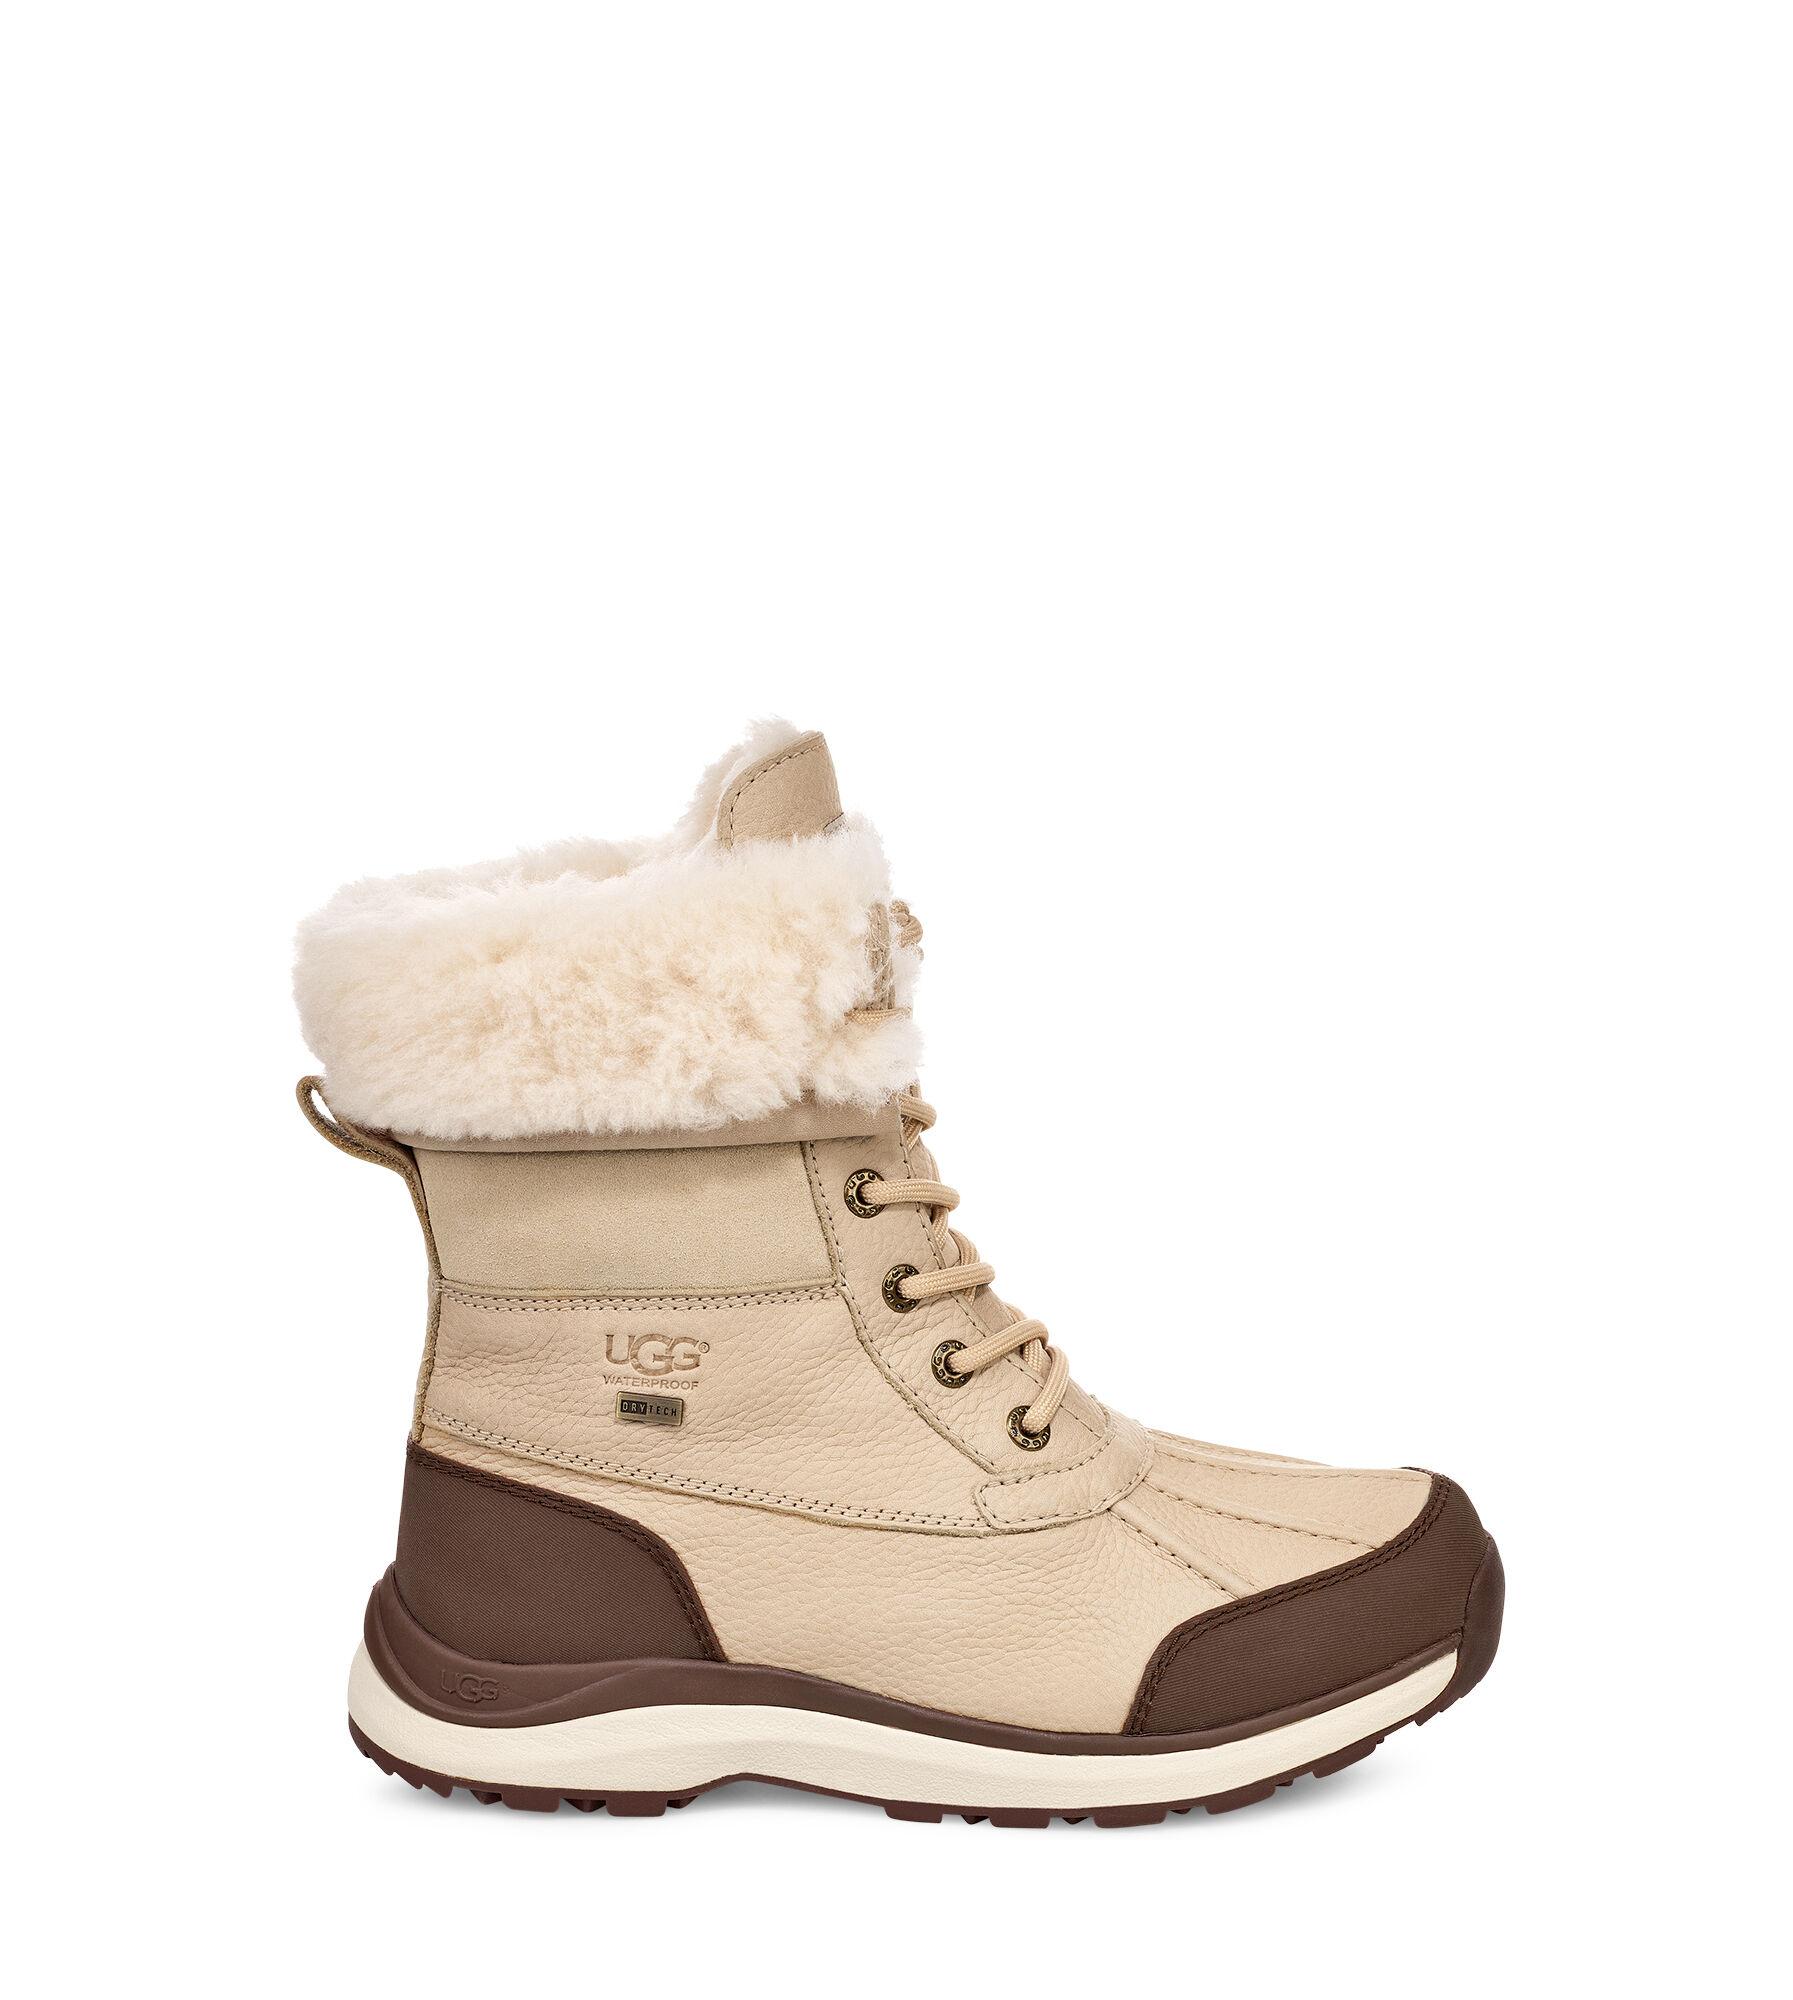 Women's Rain Boots \u0026 Waterproof Boots